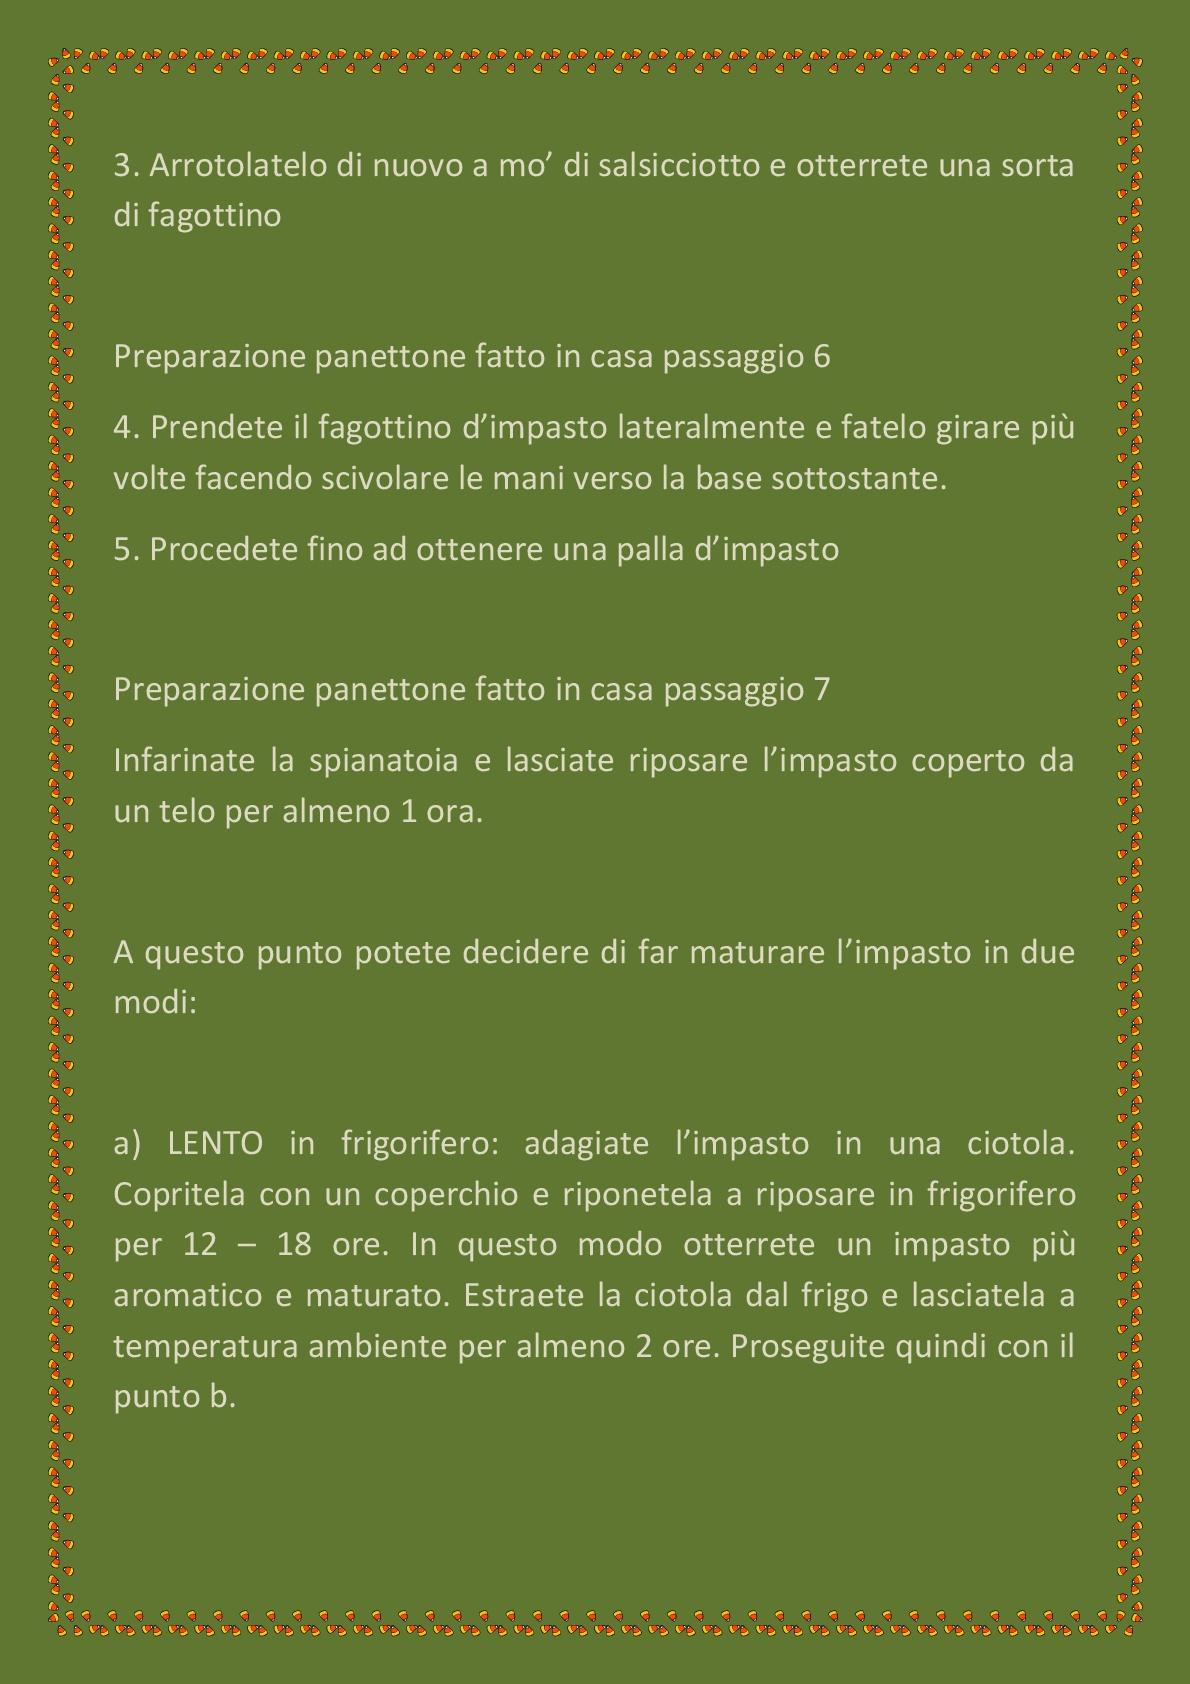 IL-RICETTARIO-(1)-007